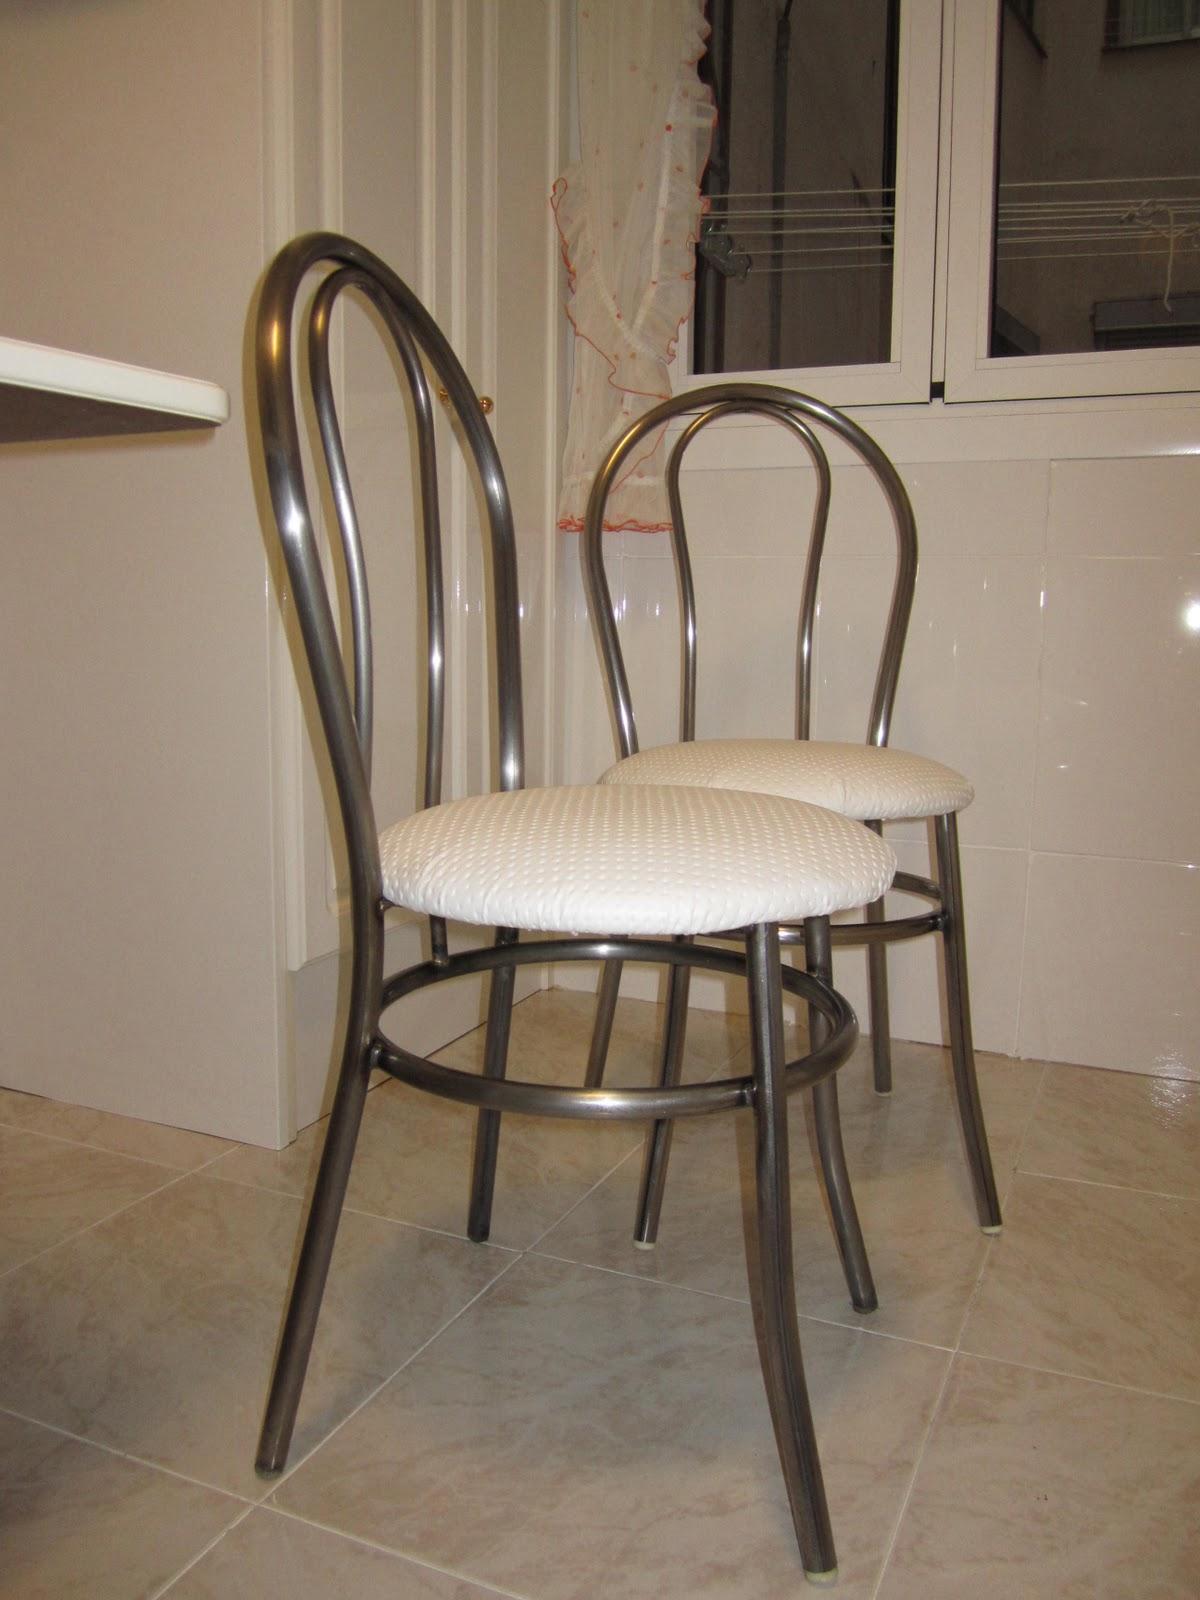 Hoy me he dado cuenta sillas de cocina - Sillas restauradas ...